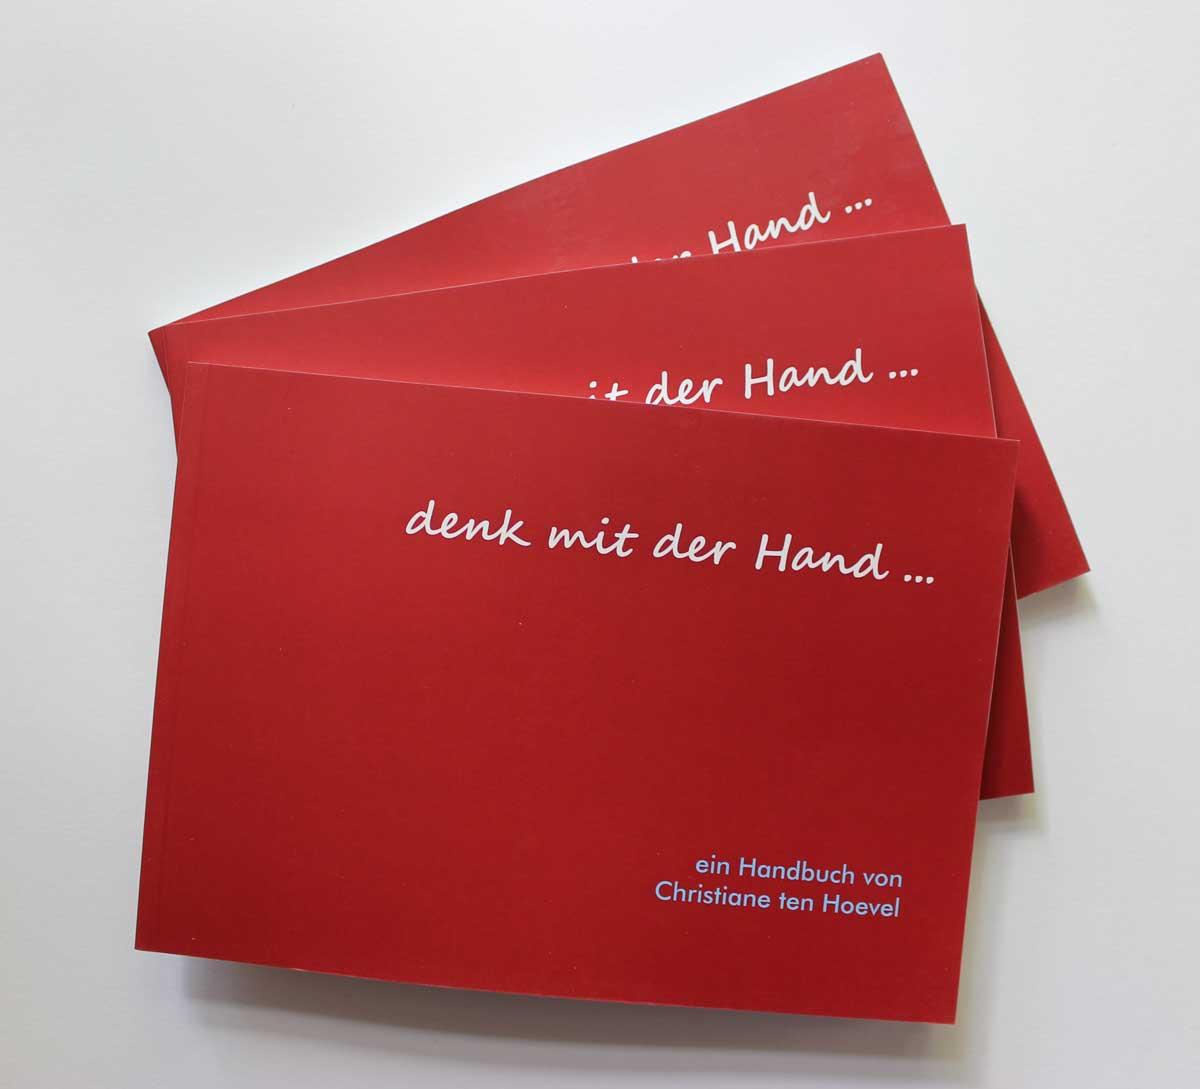 denkmitderhand_handbuch2015